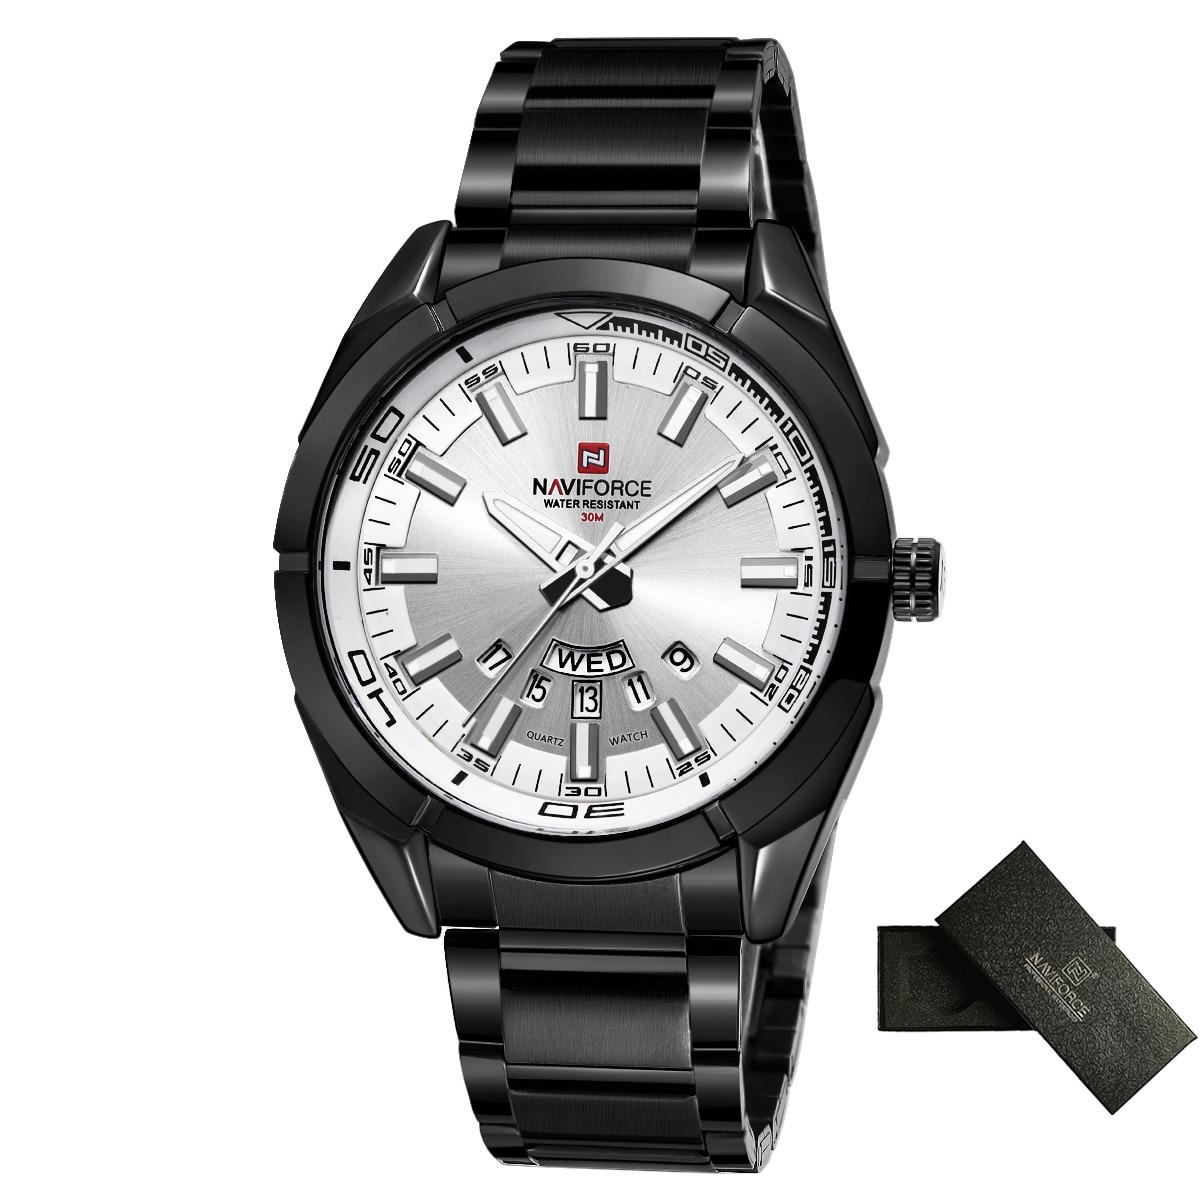 NAVIFORCE Brand Men Watches Business Quartz Watch Men's Stainless Steel Band 30M Waterproof Date Wristwatches Relogio Masculino 6